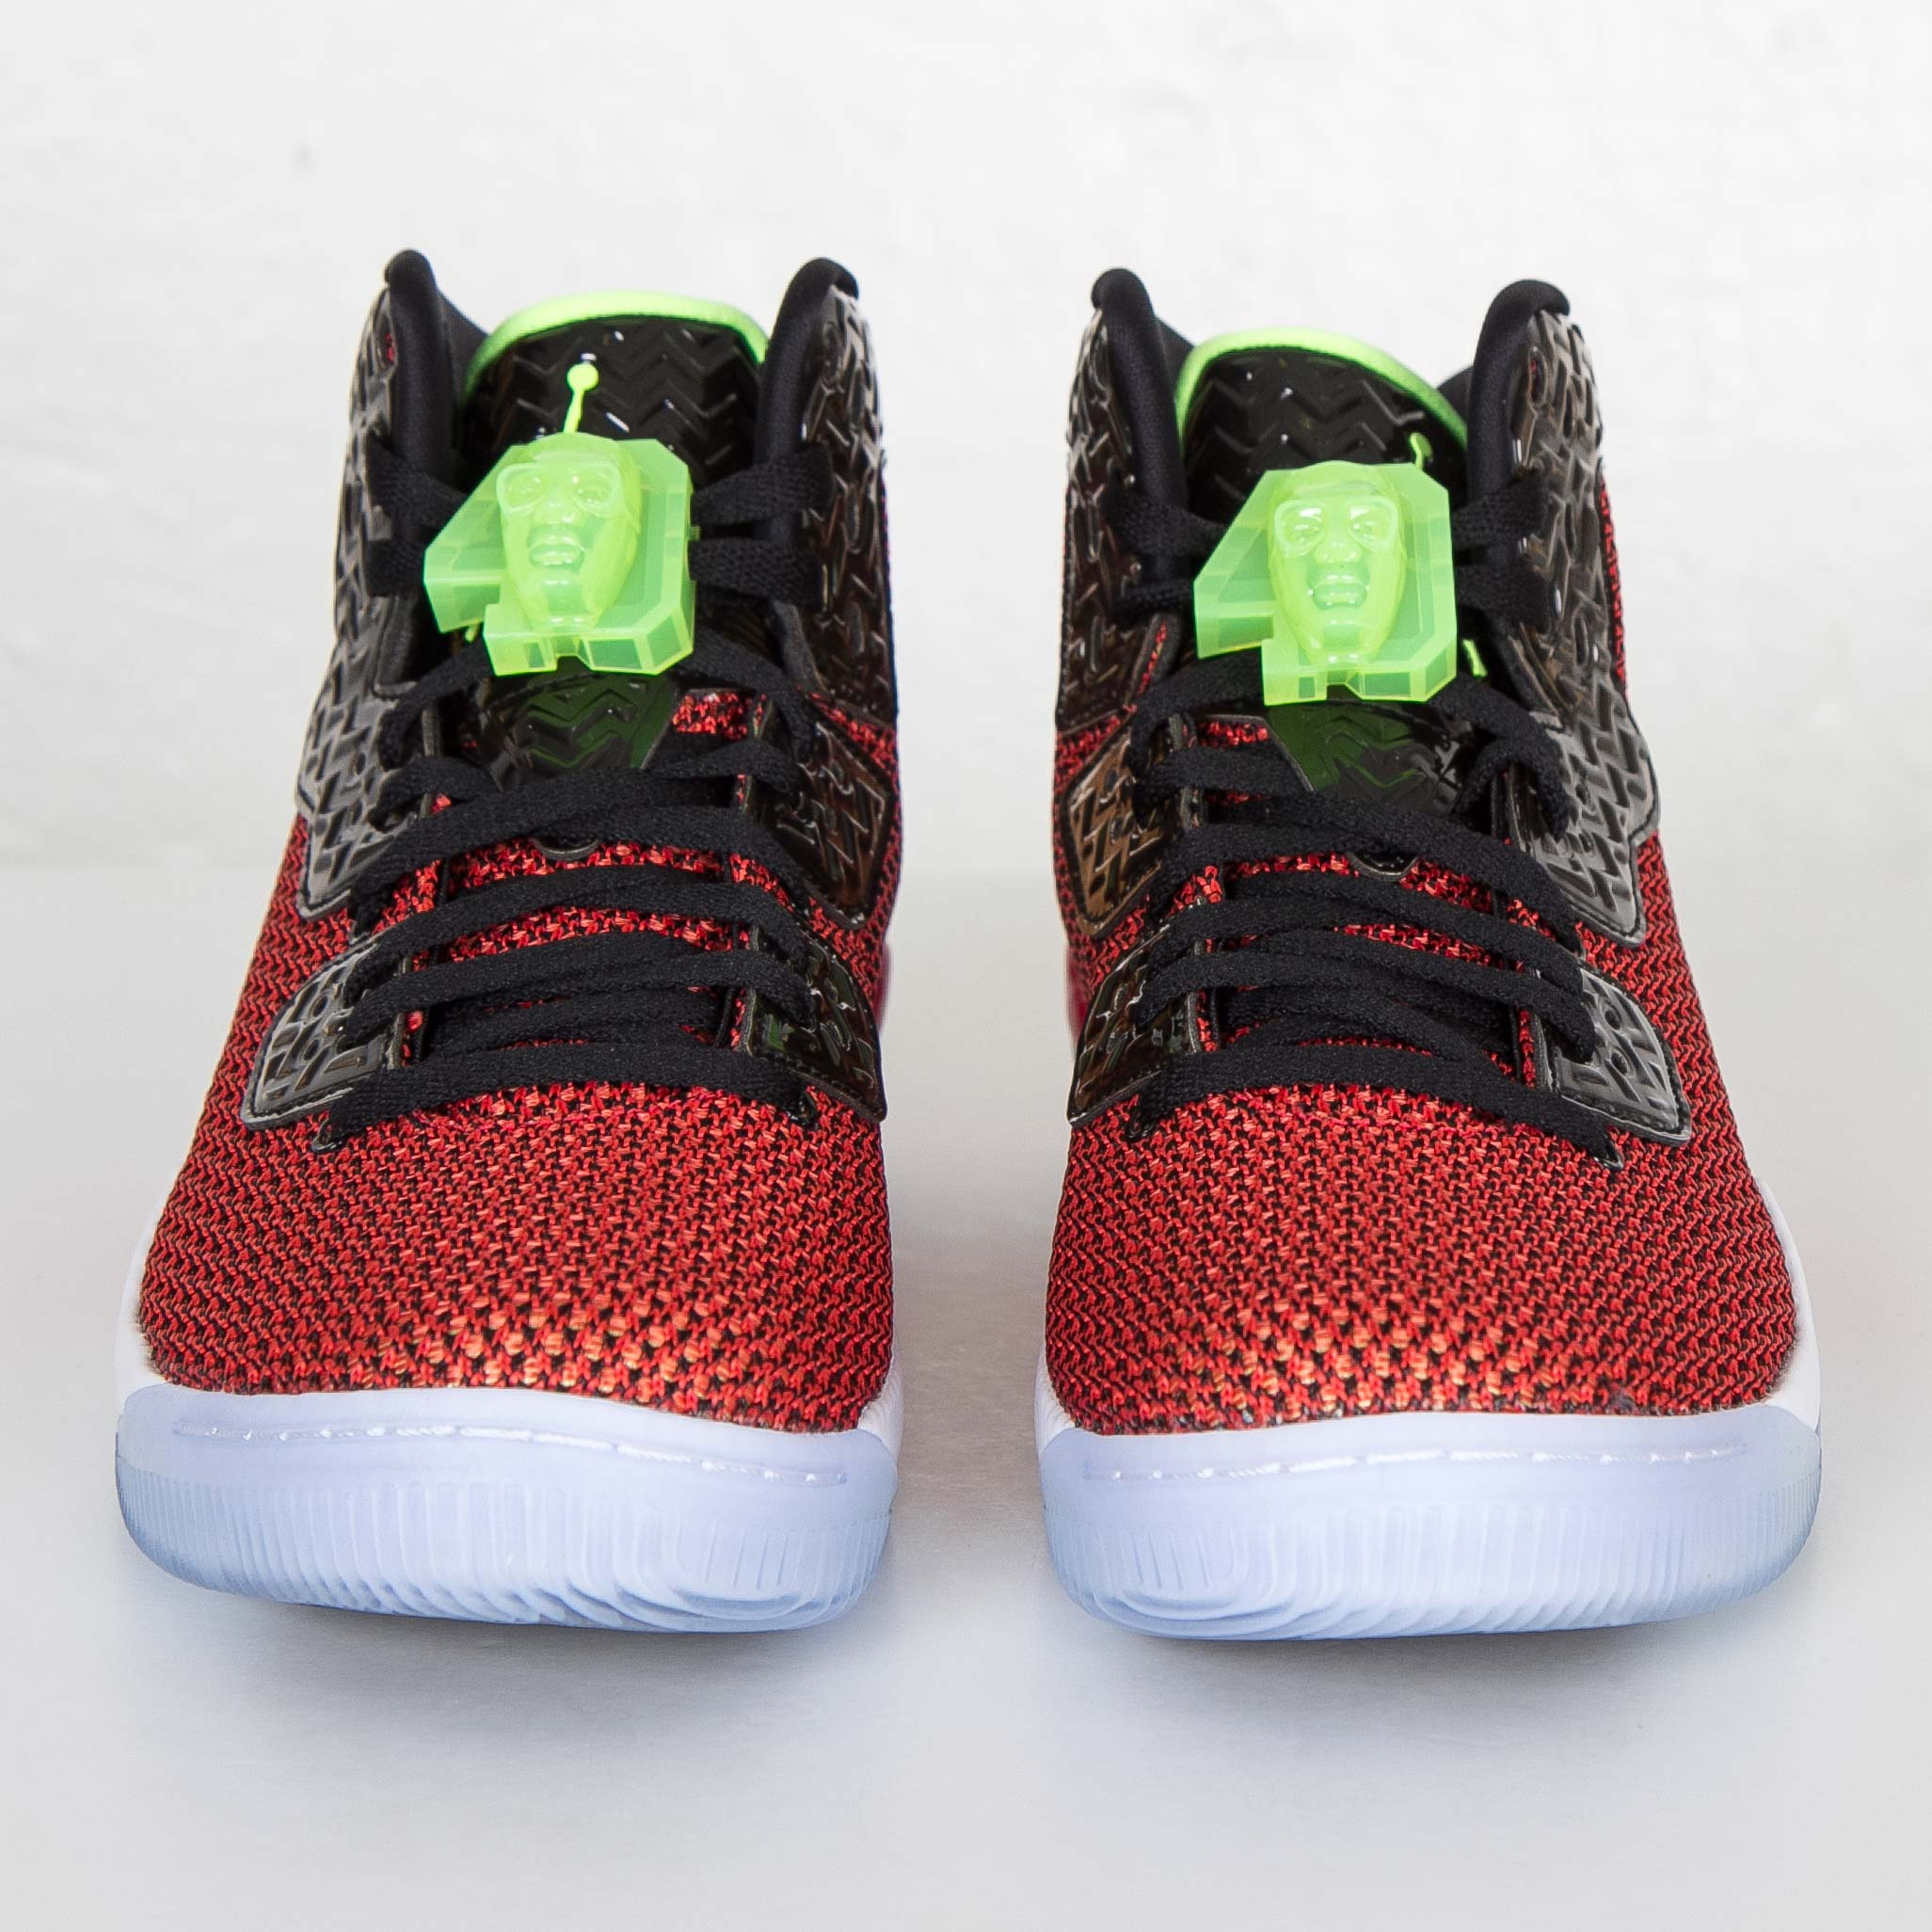 36574b562d3012 Jordan Brand Air Jordan Spike Forty - 819952-605 - Sneakersnstuff ...